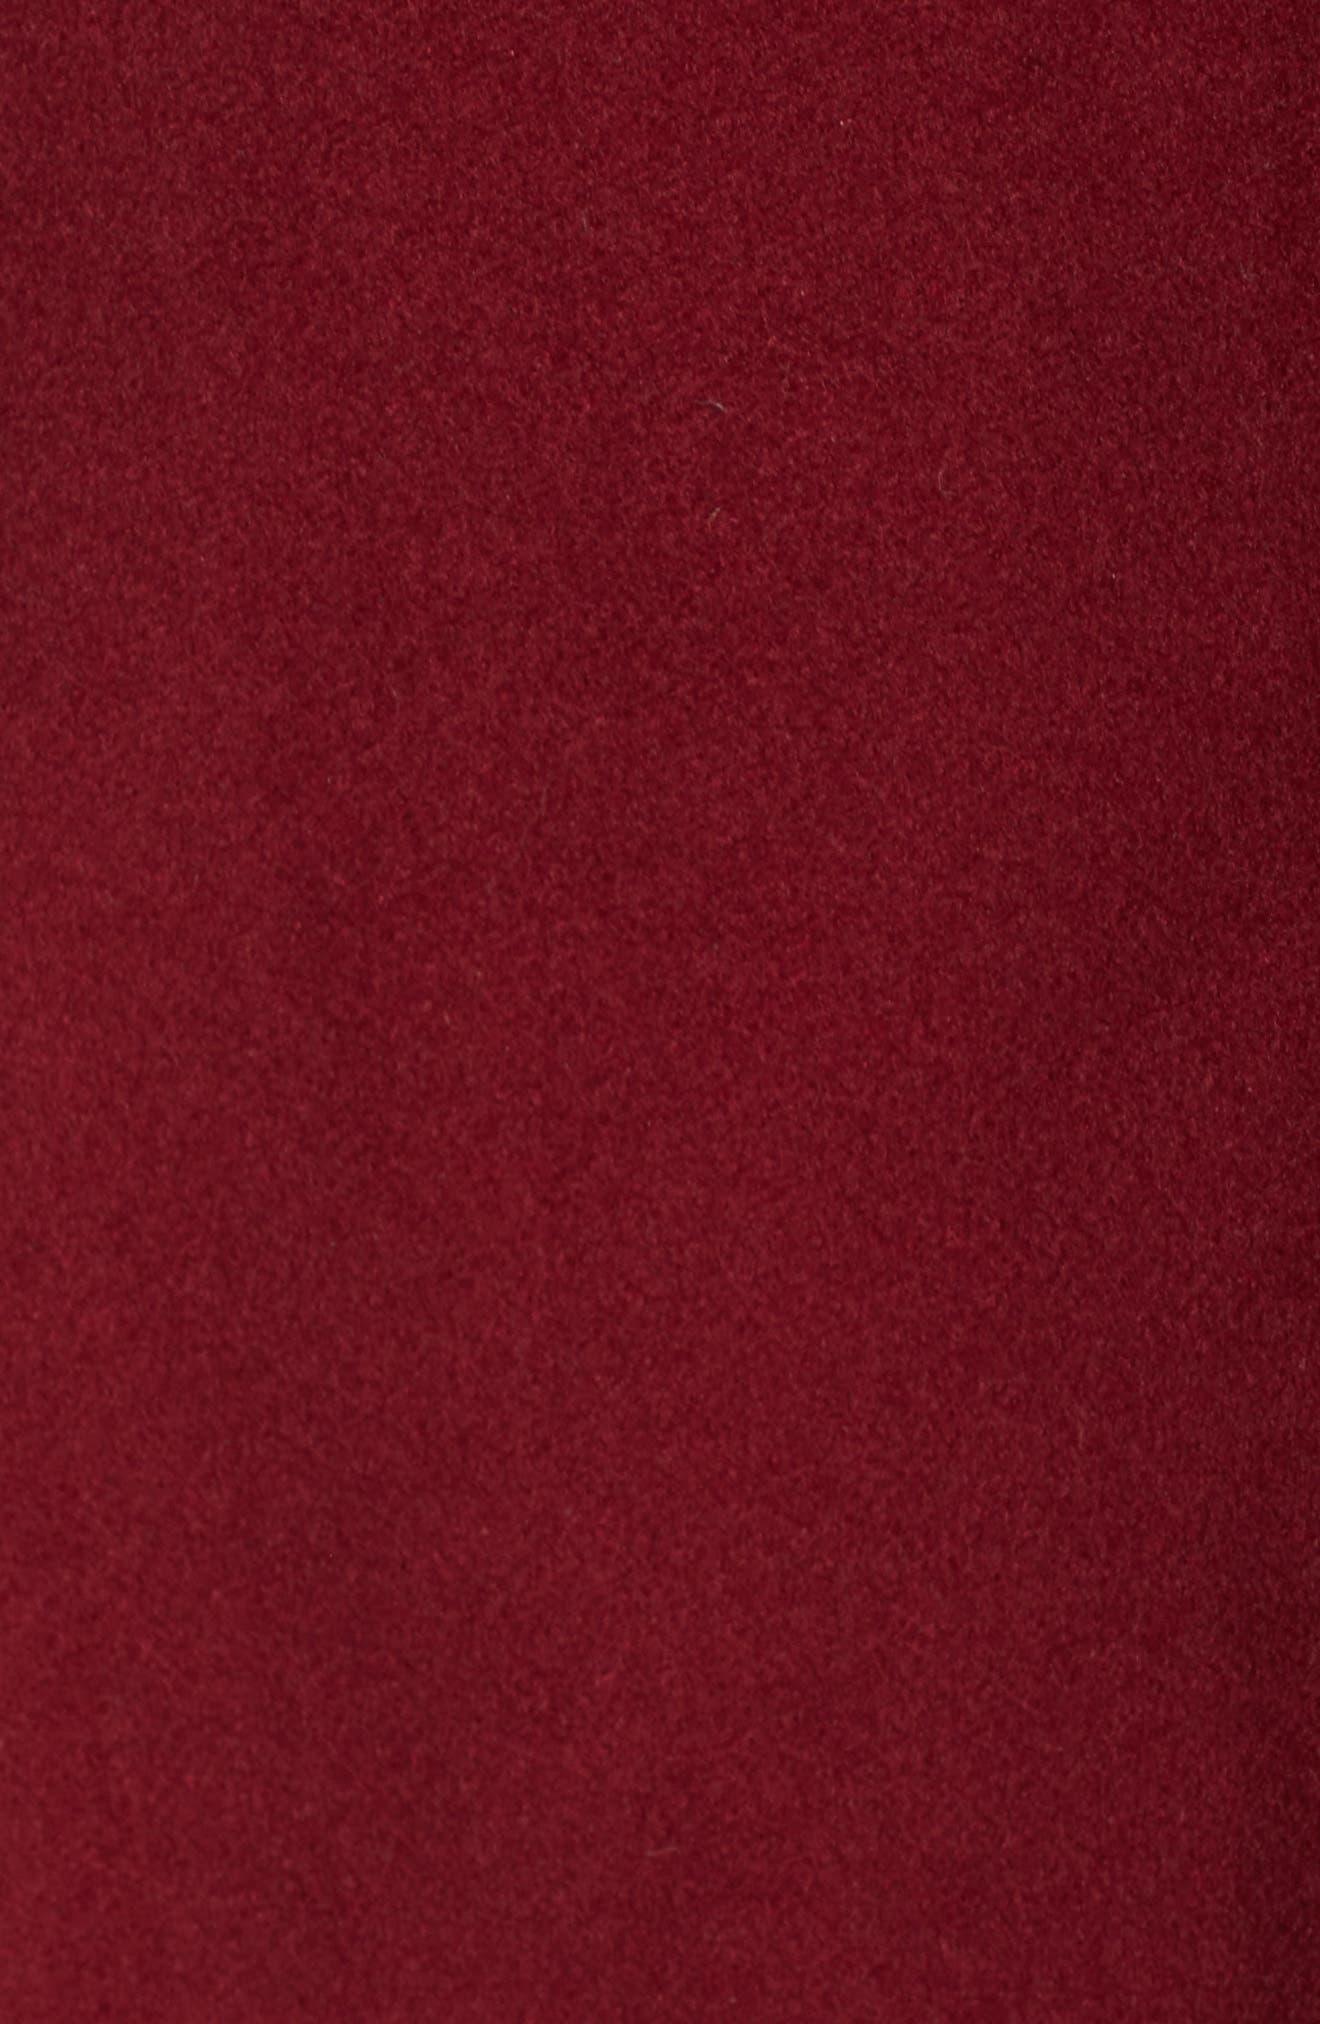 Kate Ruffle Wool Blend Coat,                             Alternate thumbnail 19, color,